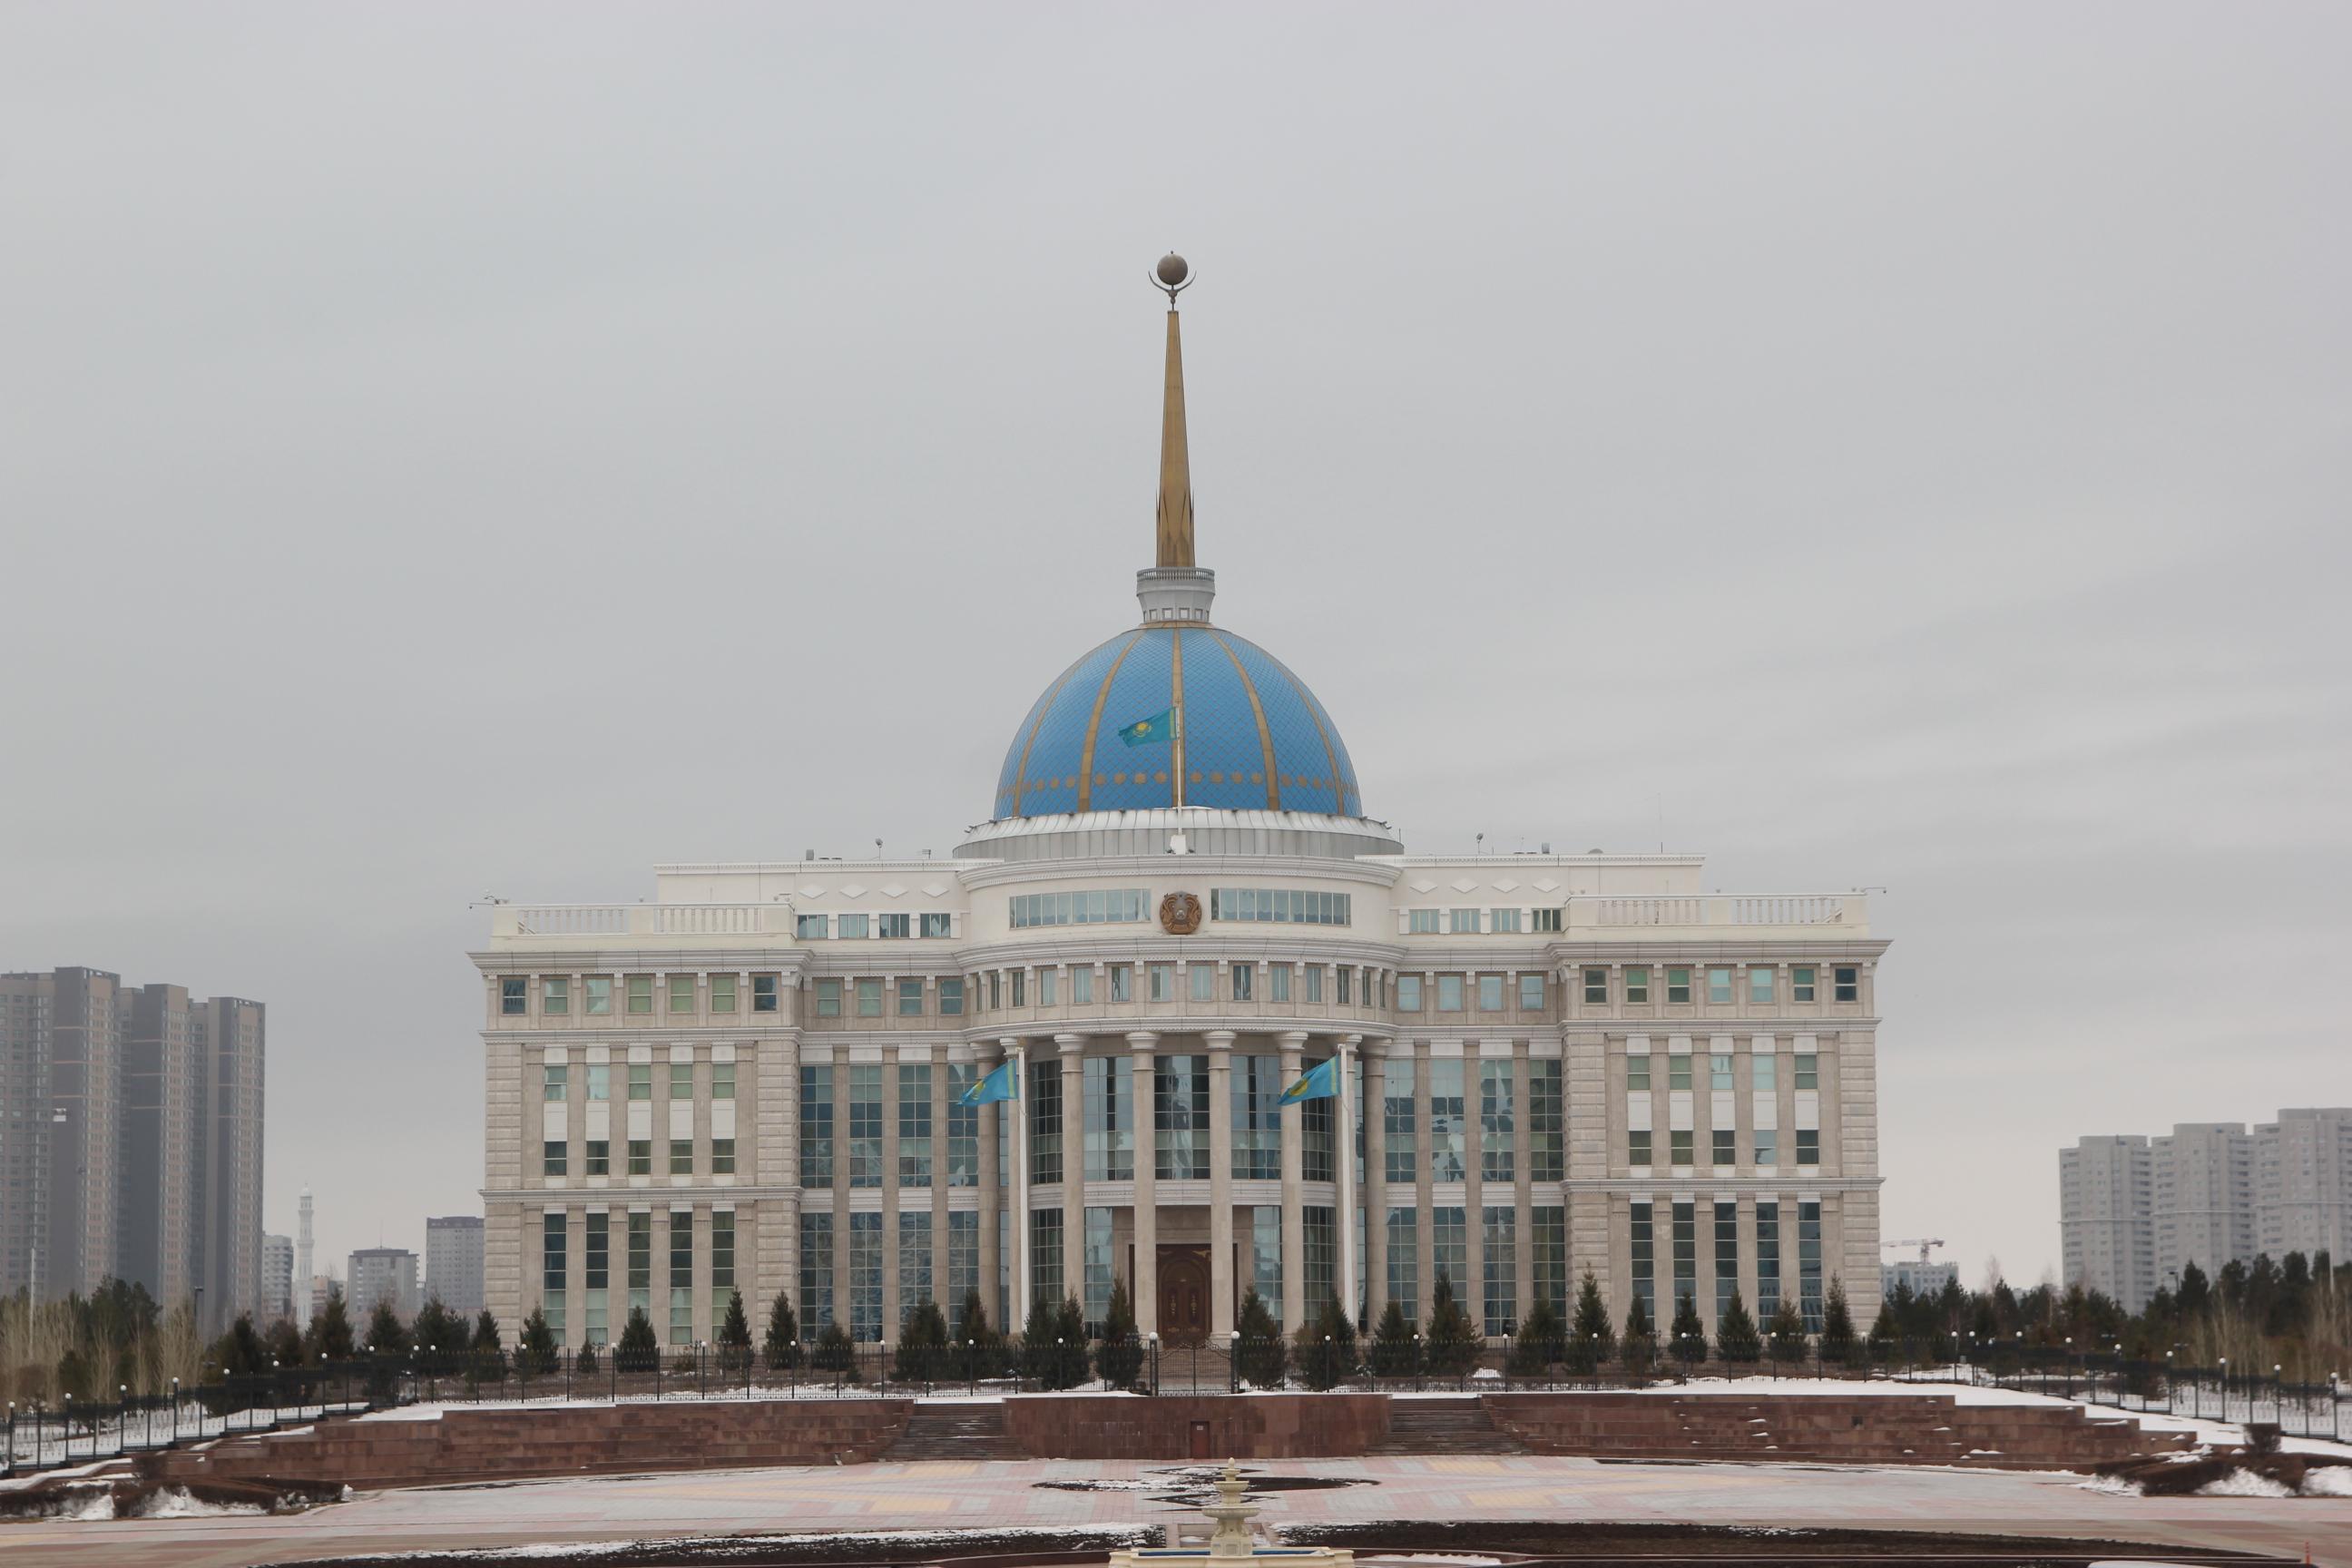 Der Präsidentenpalast in Astana